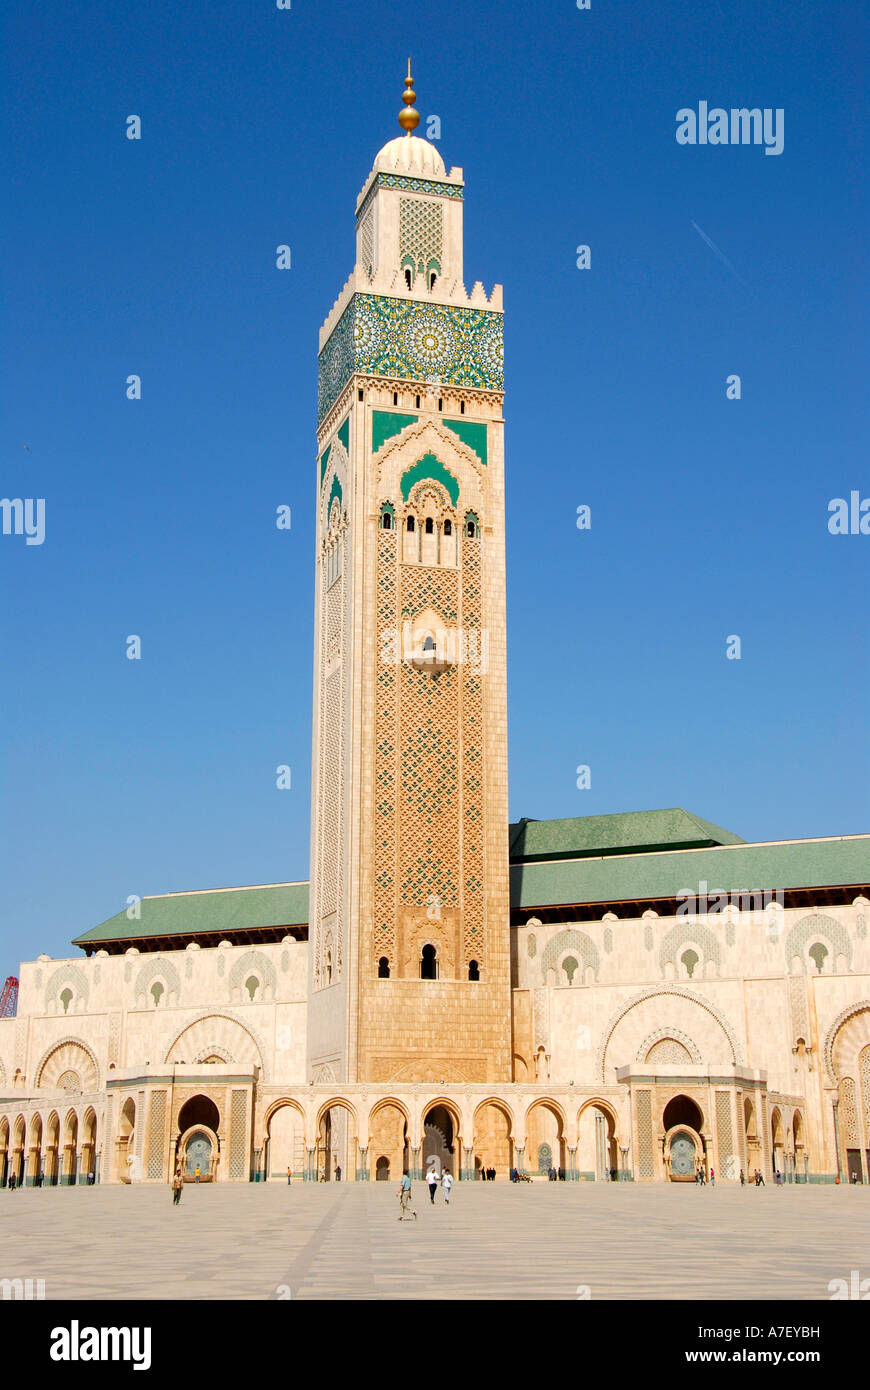 Minaret of mosque Hassan II Casablanca Morocco Stock Photo